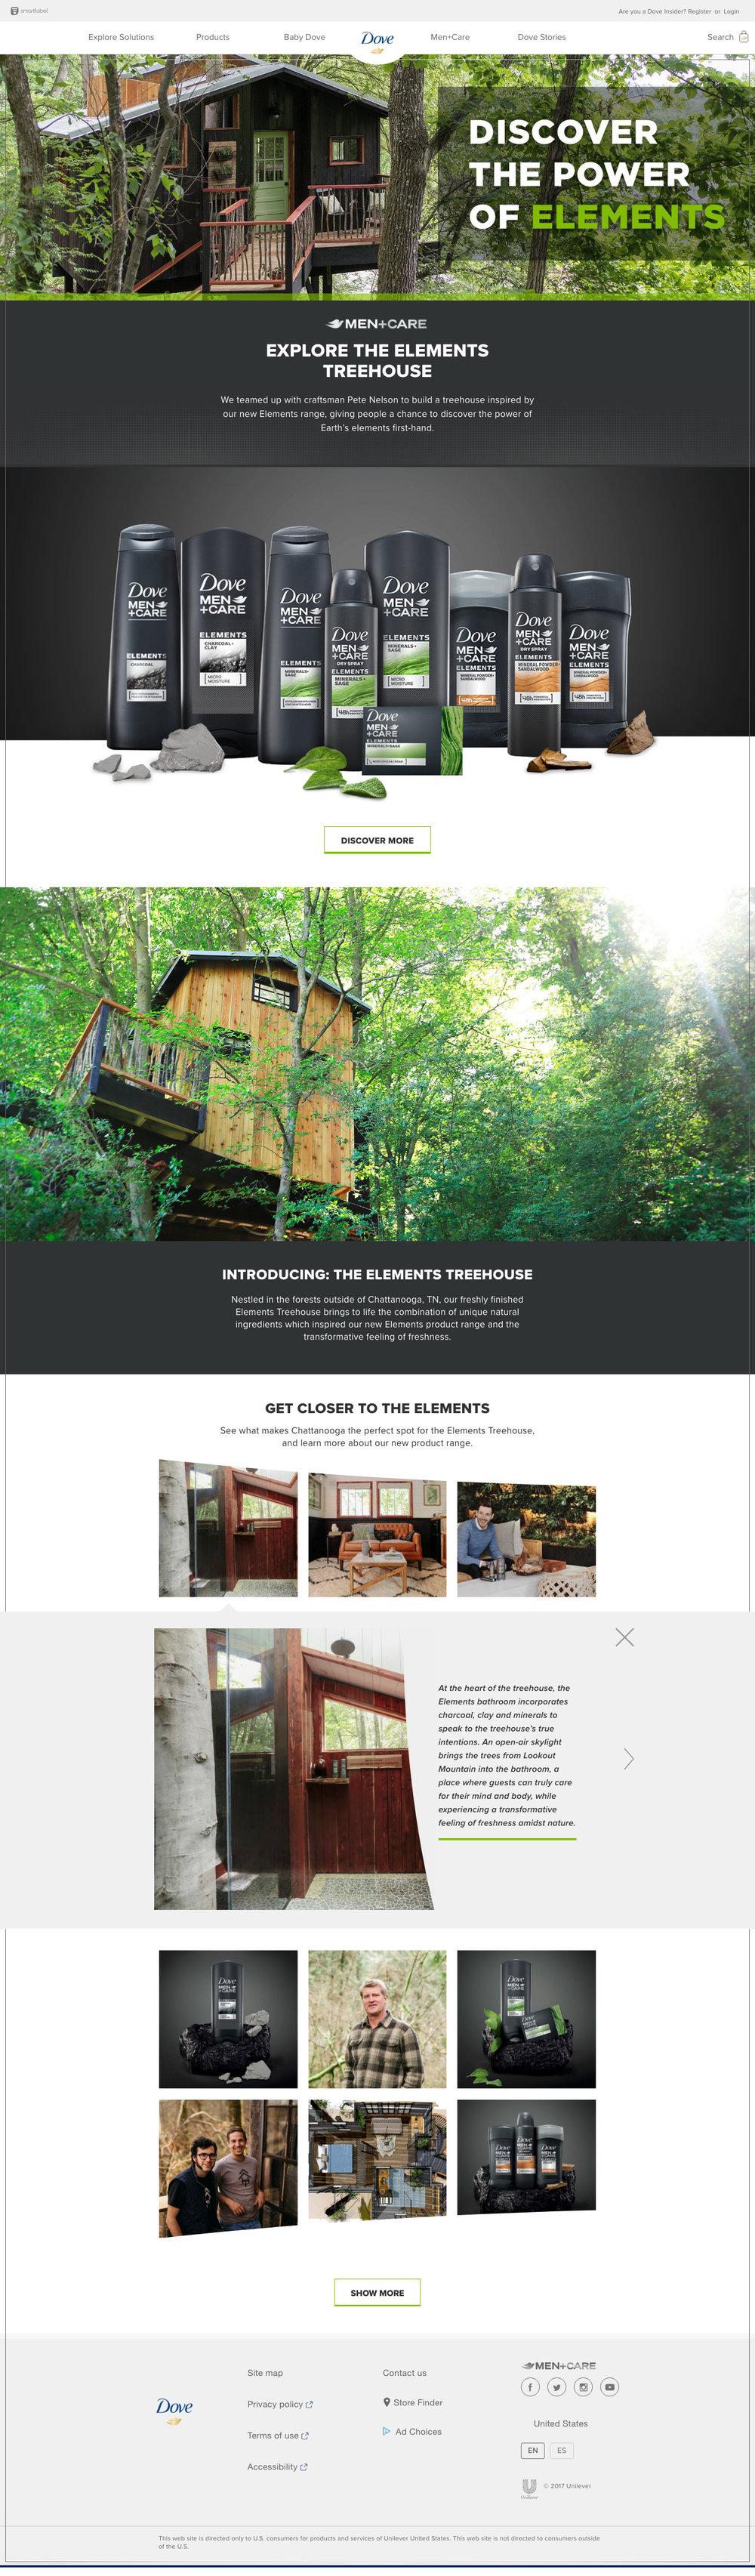 treehouse-psdl.jpg